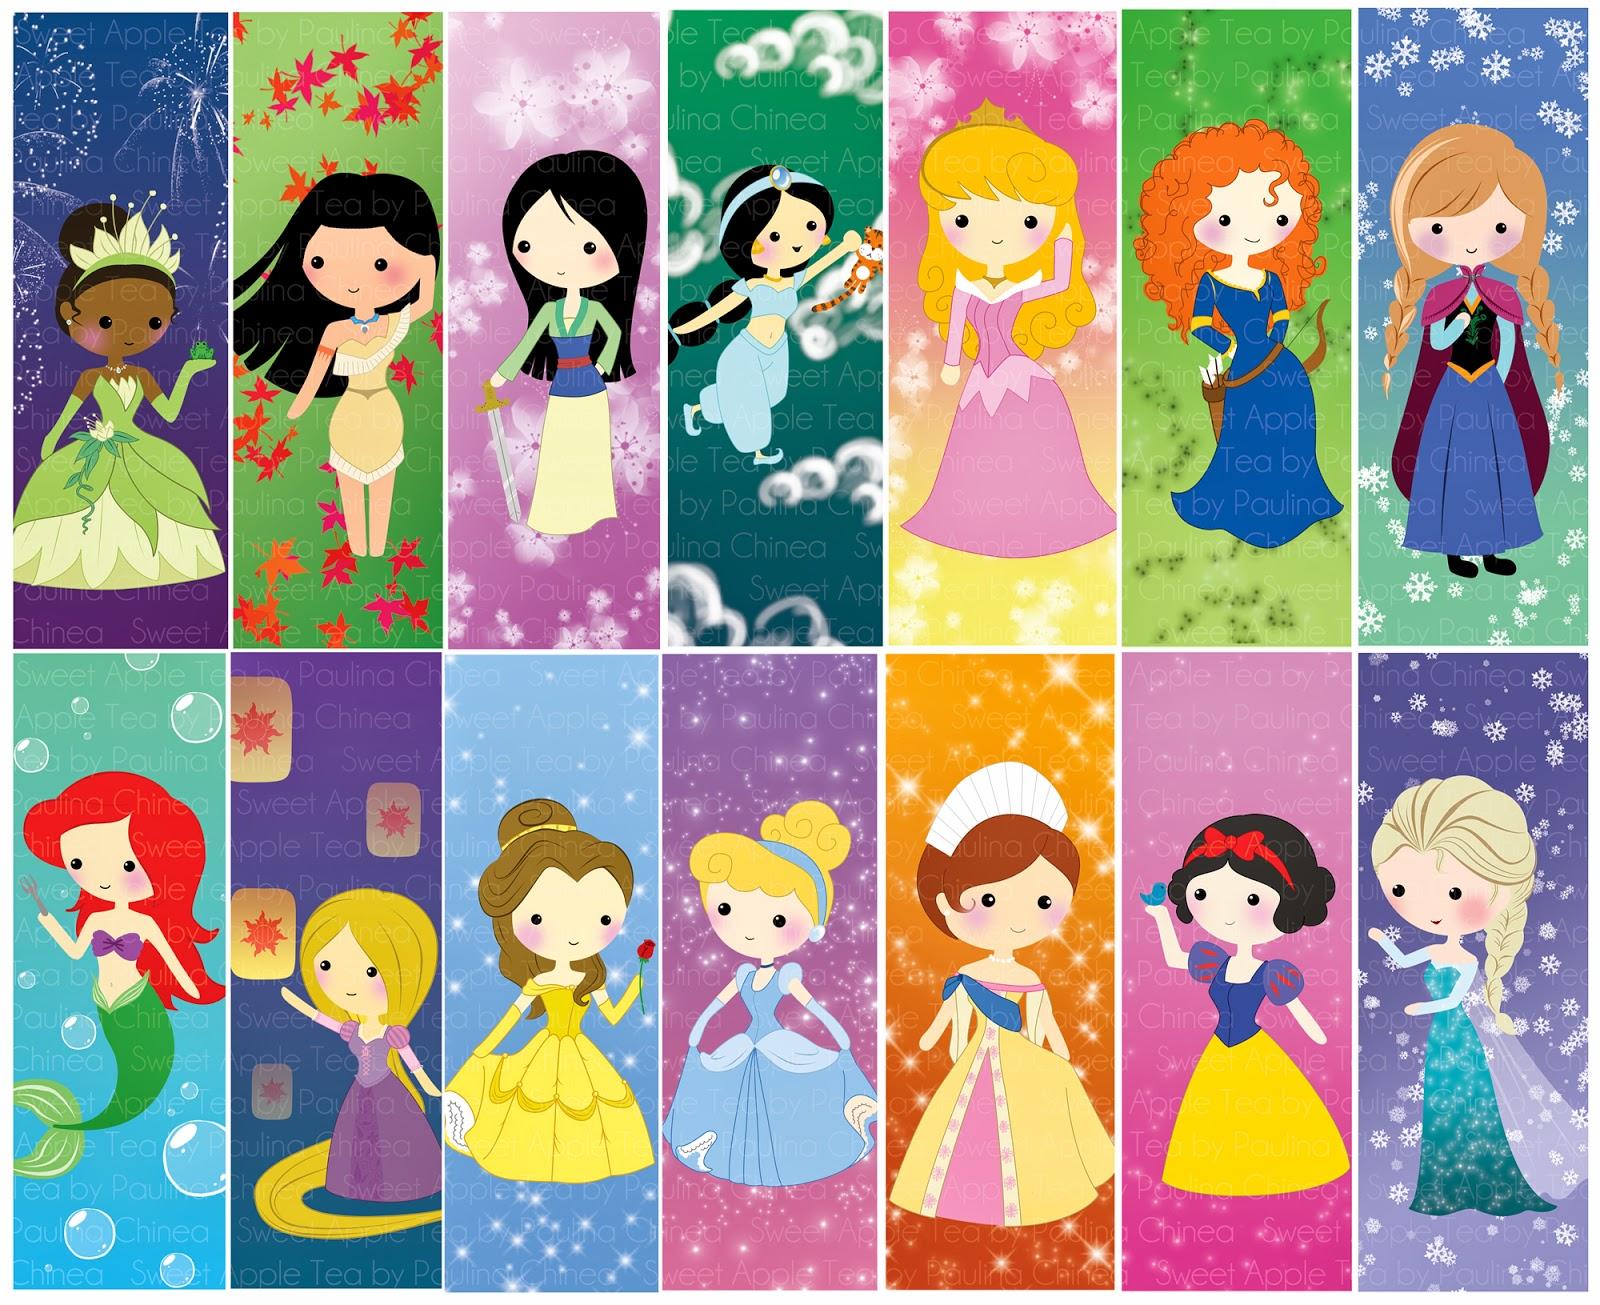 http://paulinachinea.deviantart.com/art/Chibi-Princesses-366526836